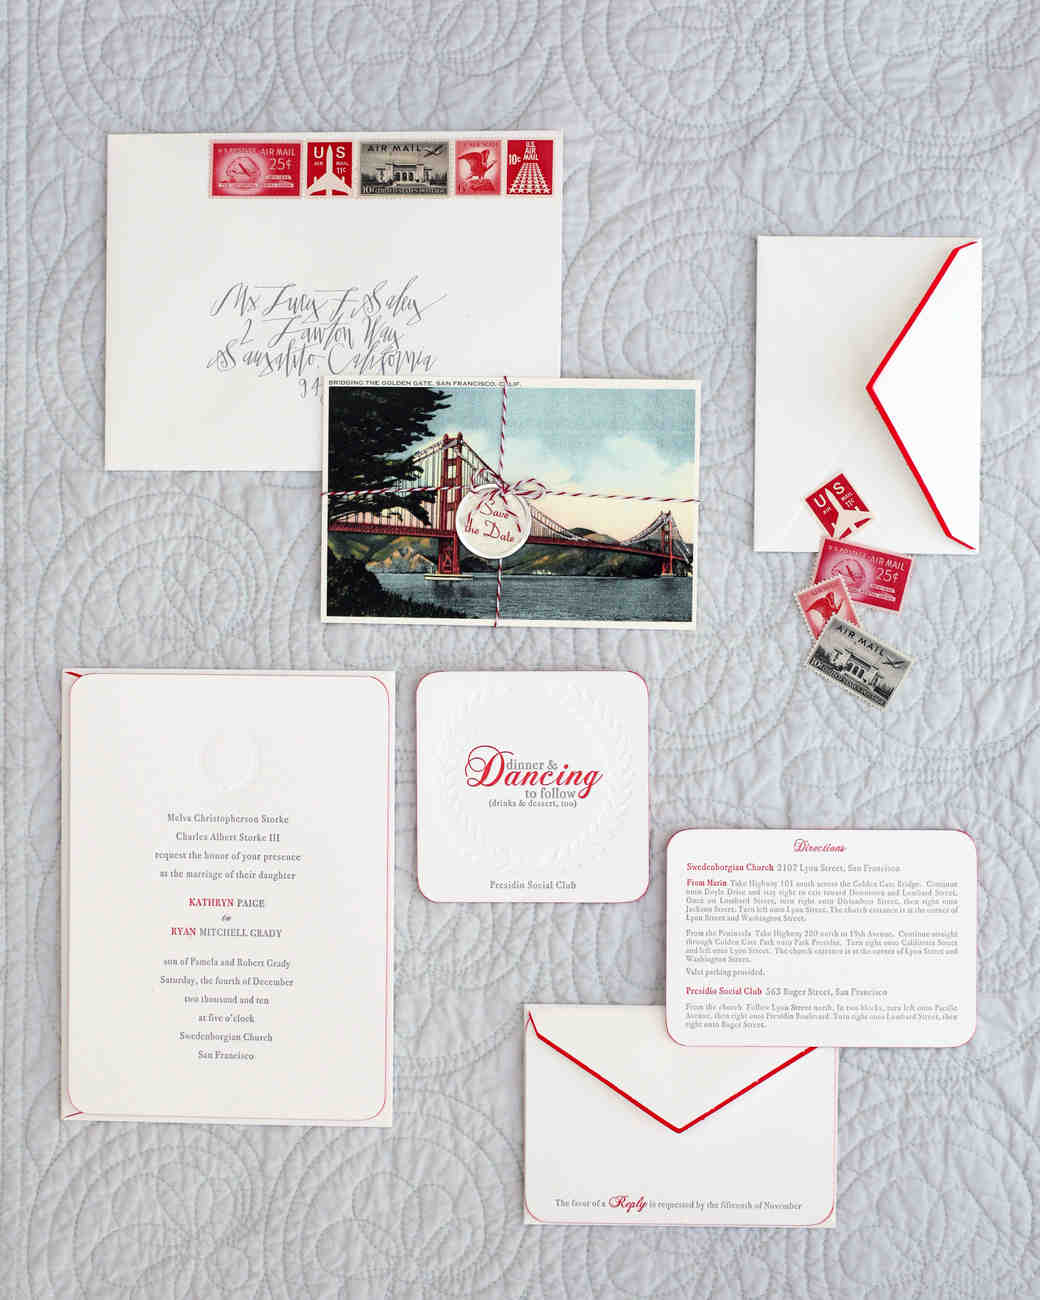 29 Festive Ideas for a Christmas Wedding – Wedding Invitations Christmas